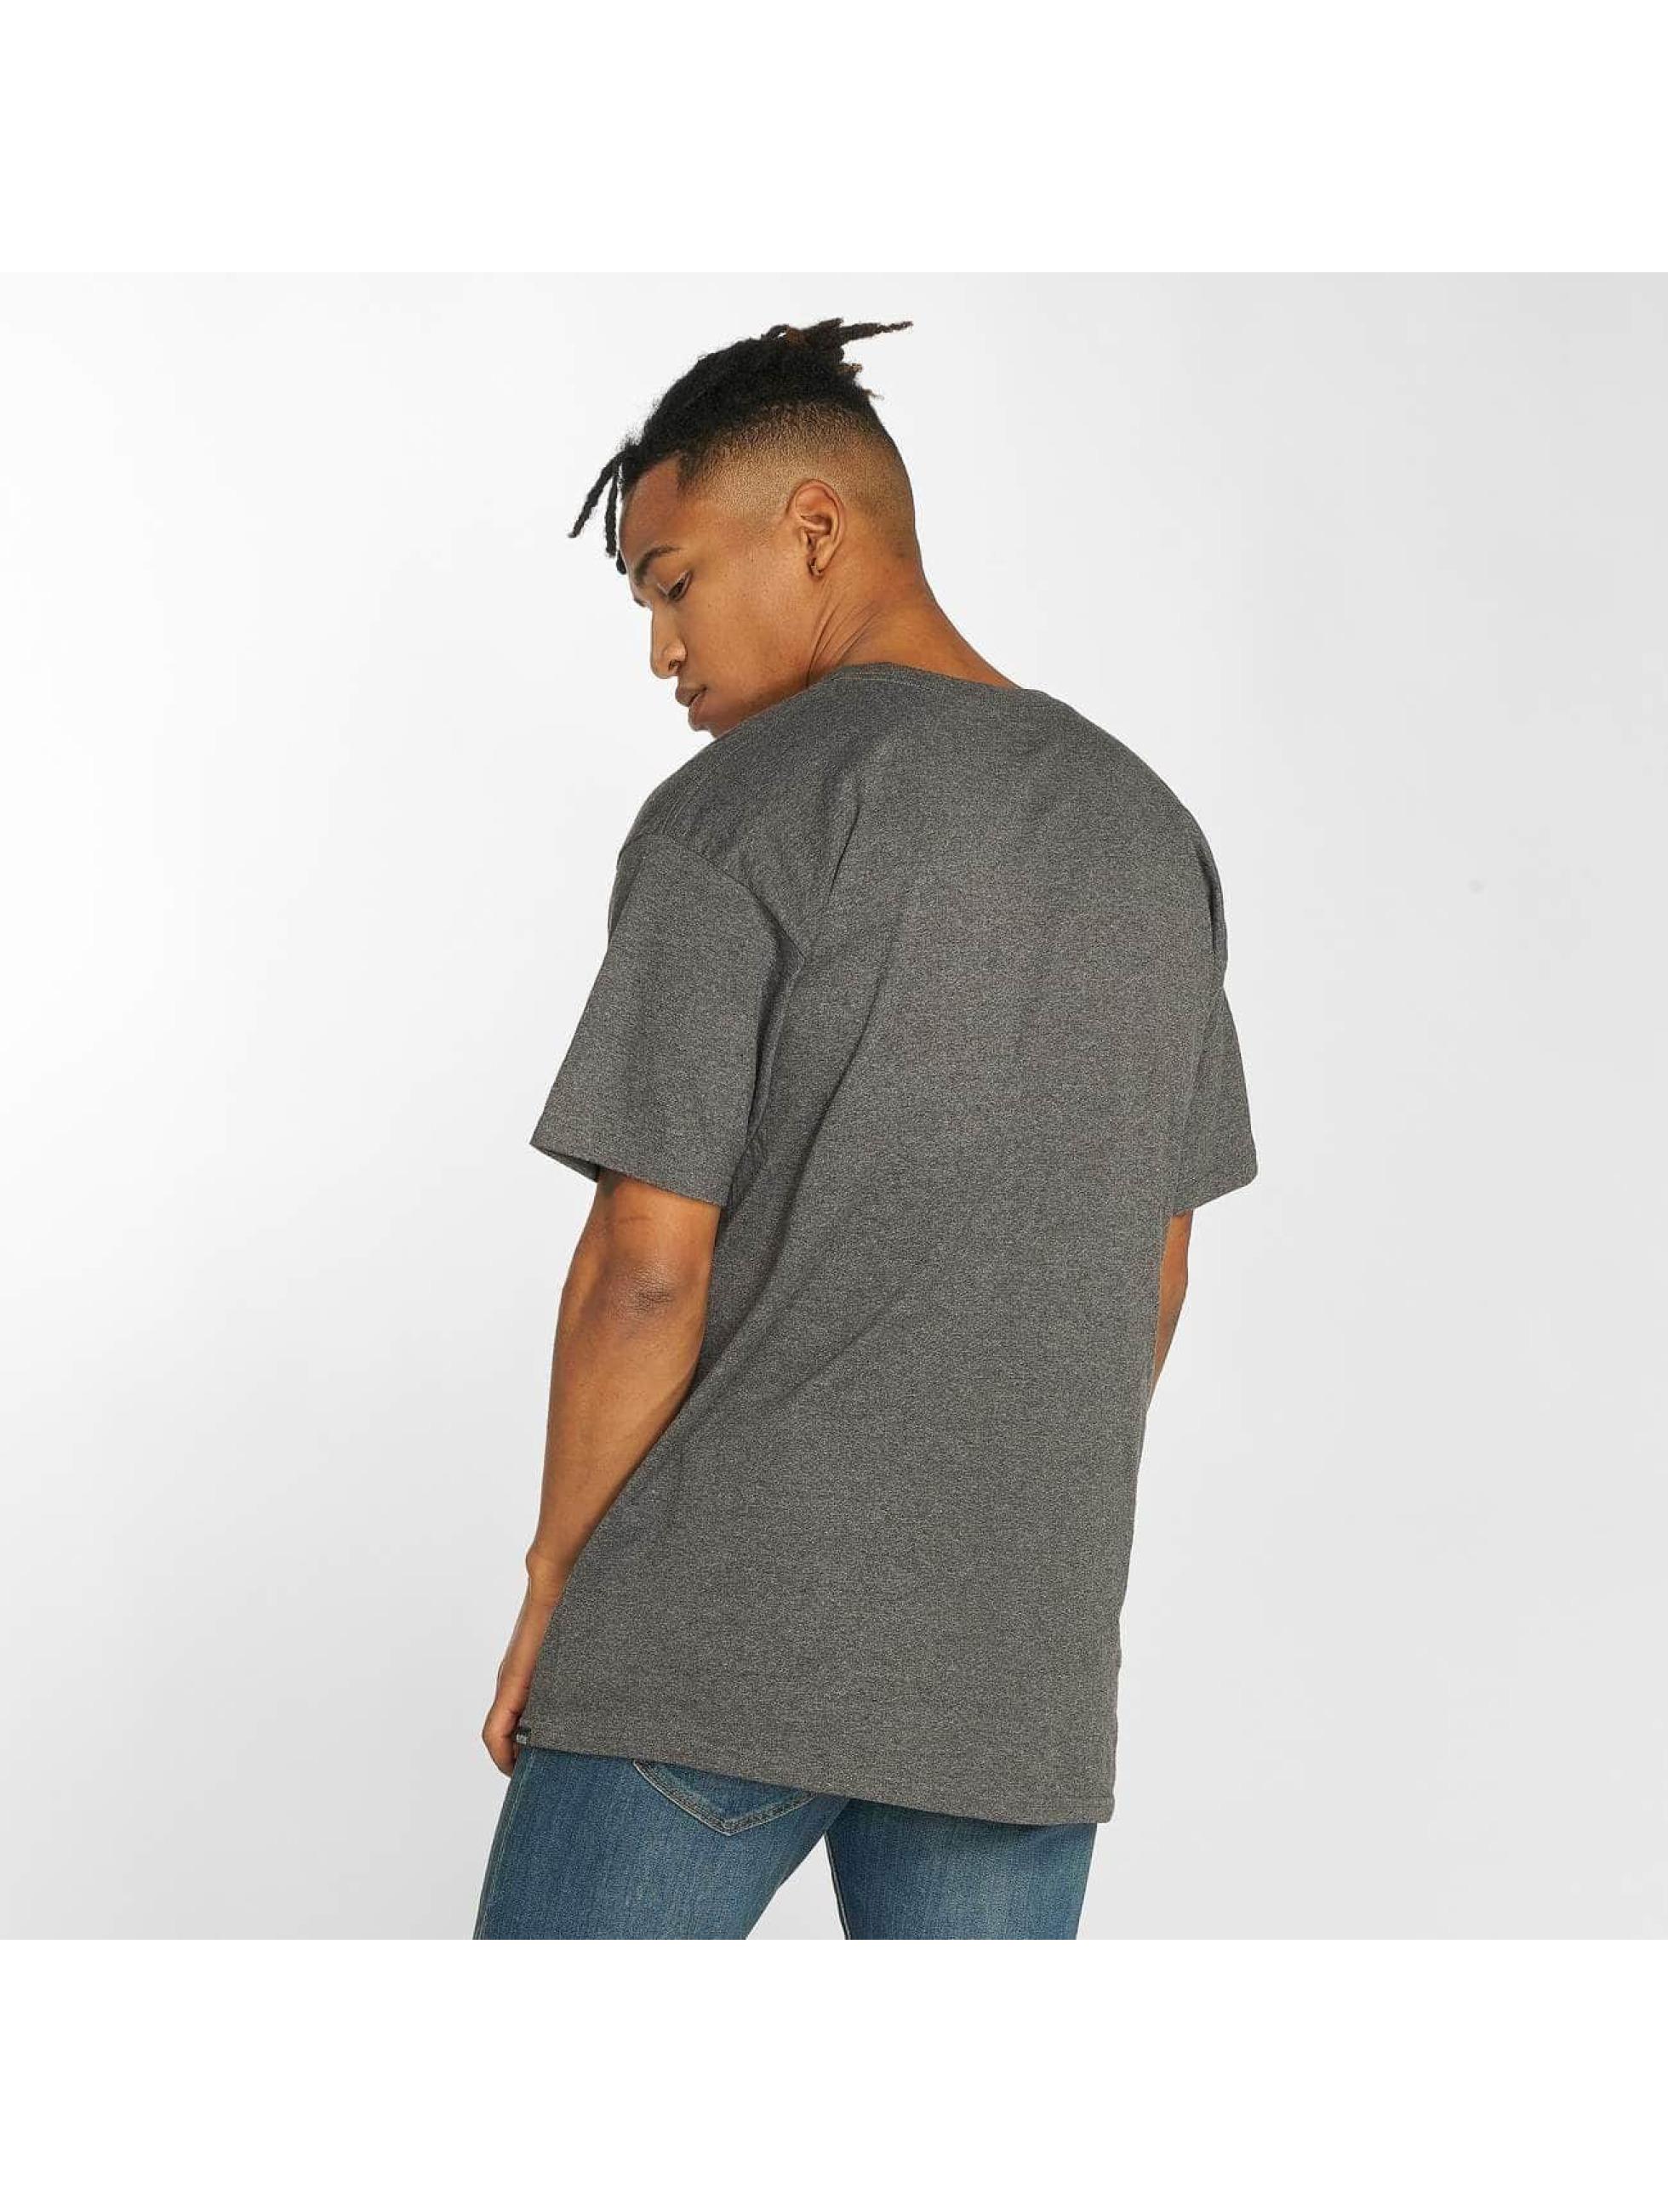 Etnies T-Shirt Mod Stencil grau